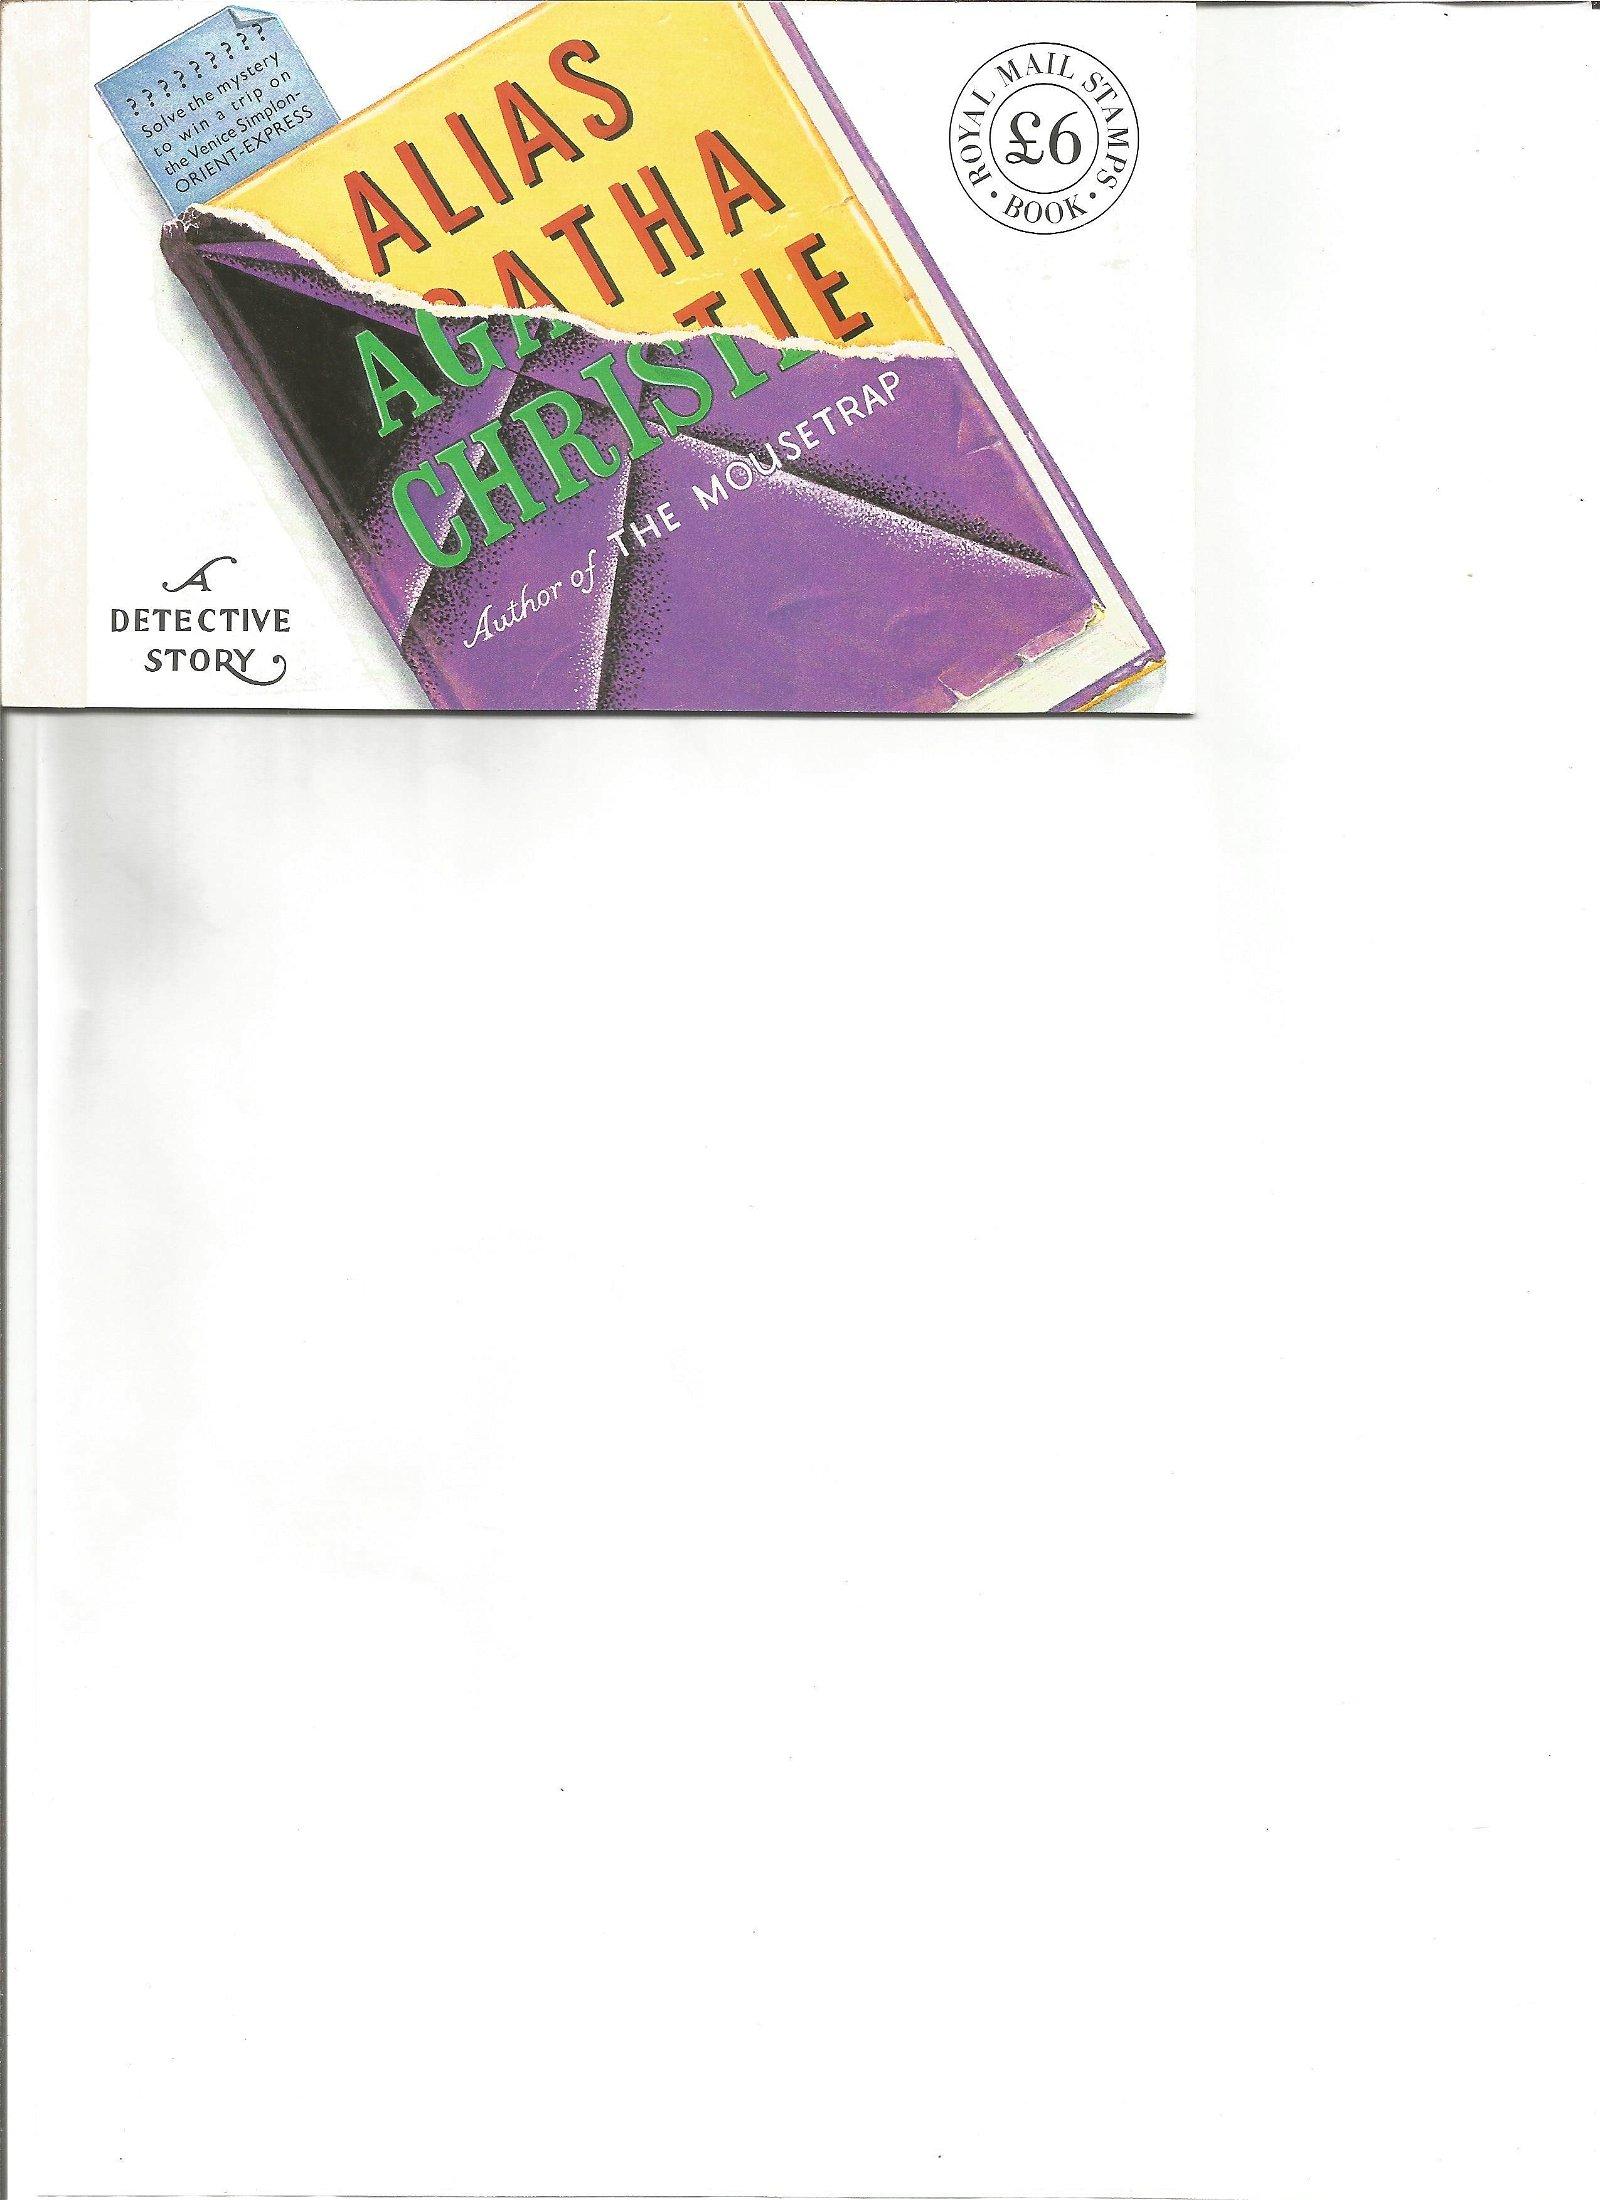 Royal mail complete prestige stamp booklet A detective